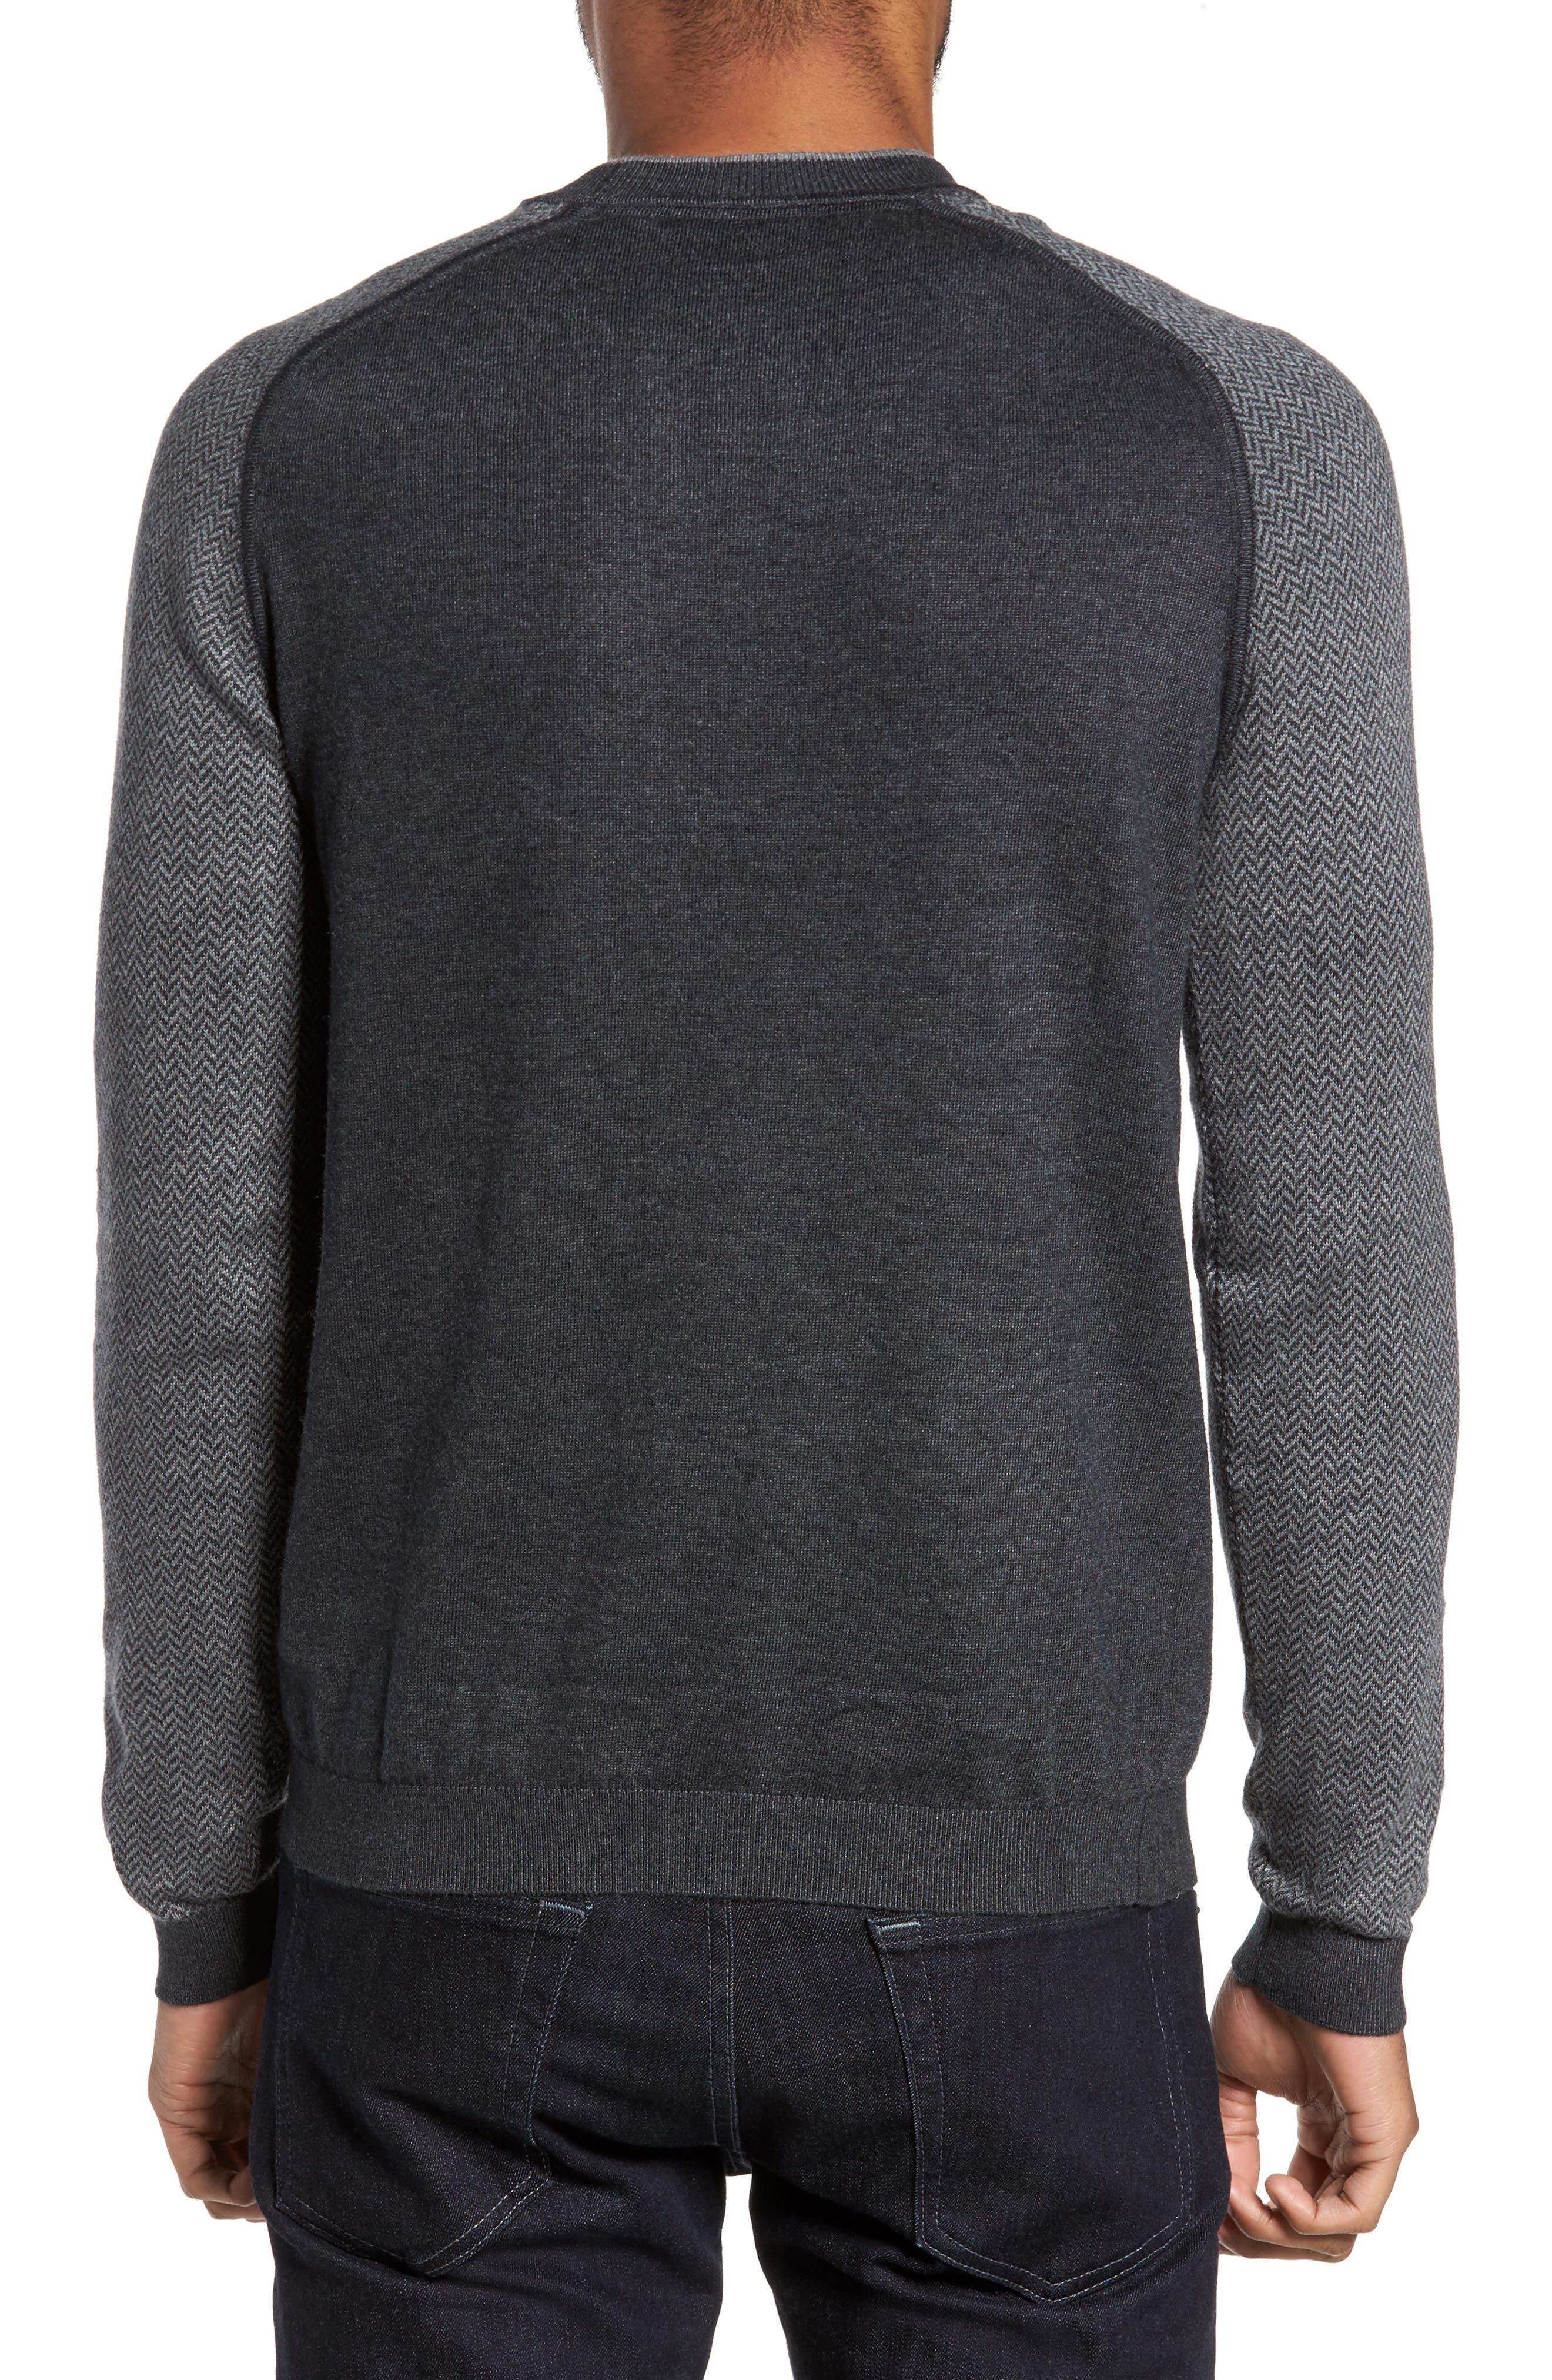 Pepmint Herringbone Sleeve Sweatshirt,                             Alternate thumbnail 3, color,